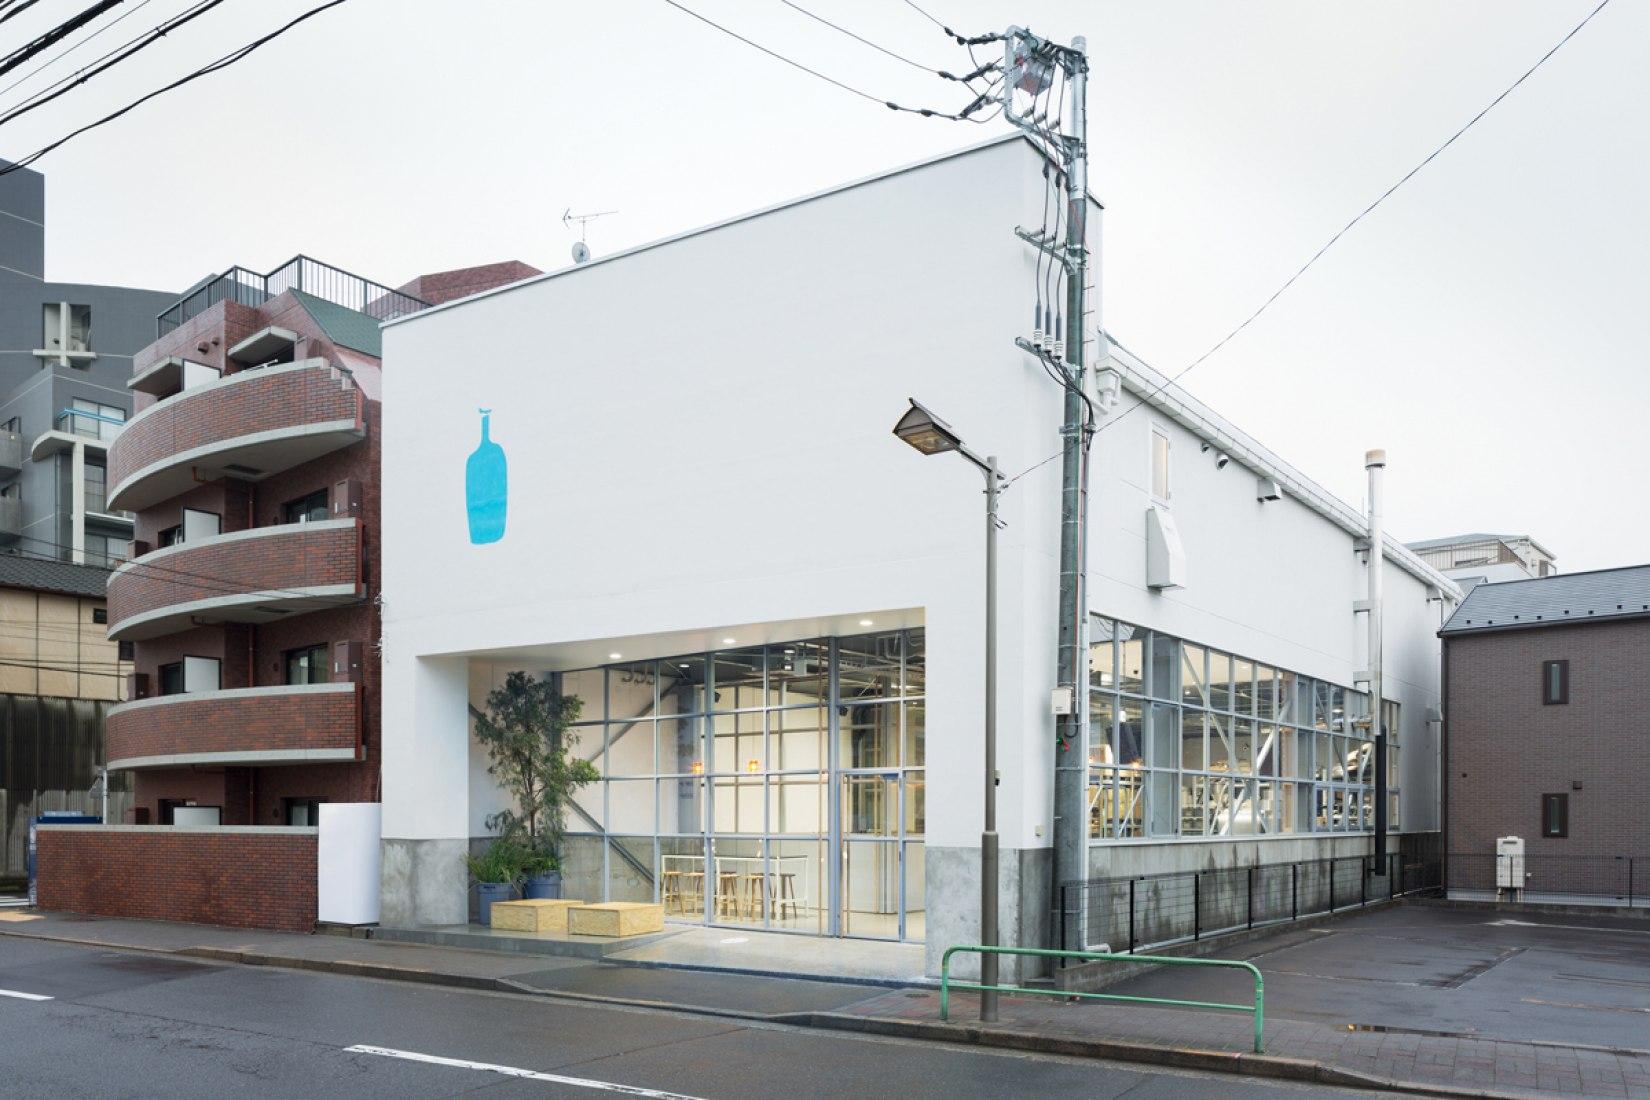 Vista con el entorno. Blue Bottle Coffee Kiyosumi-Shirakawa Roastery & Cafe por Jo Nagasaka / Schemata Architects. Fotografía © Takumi Ota.